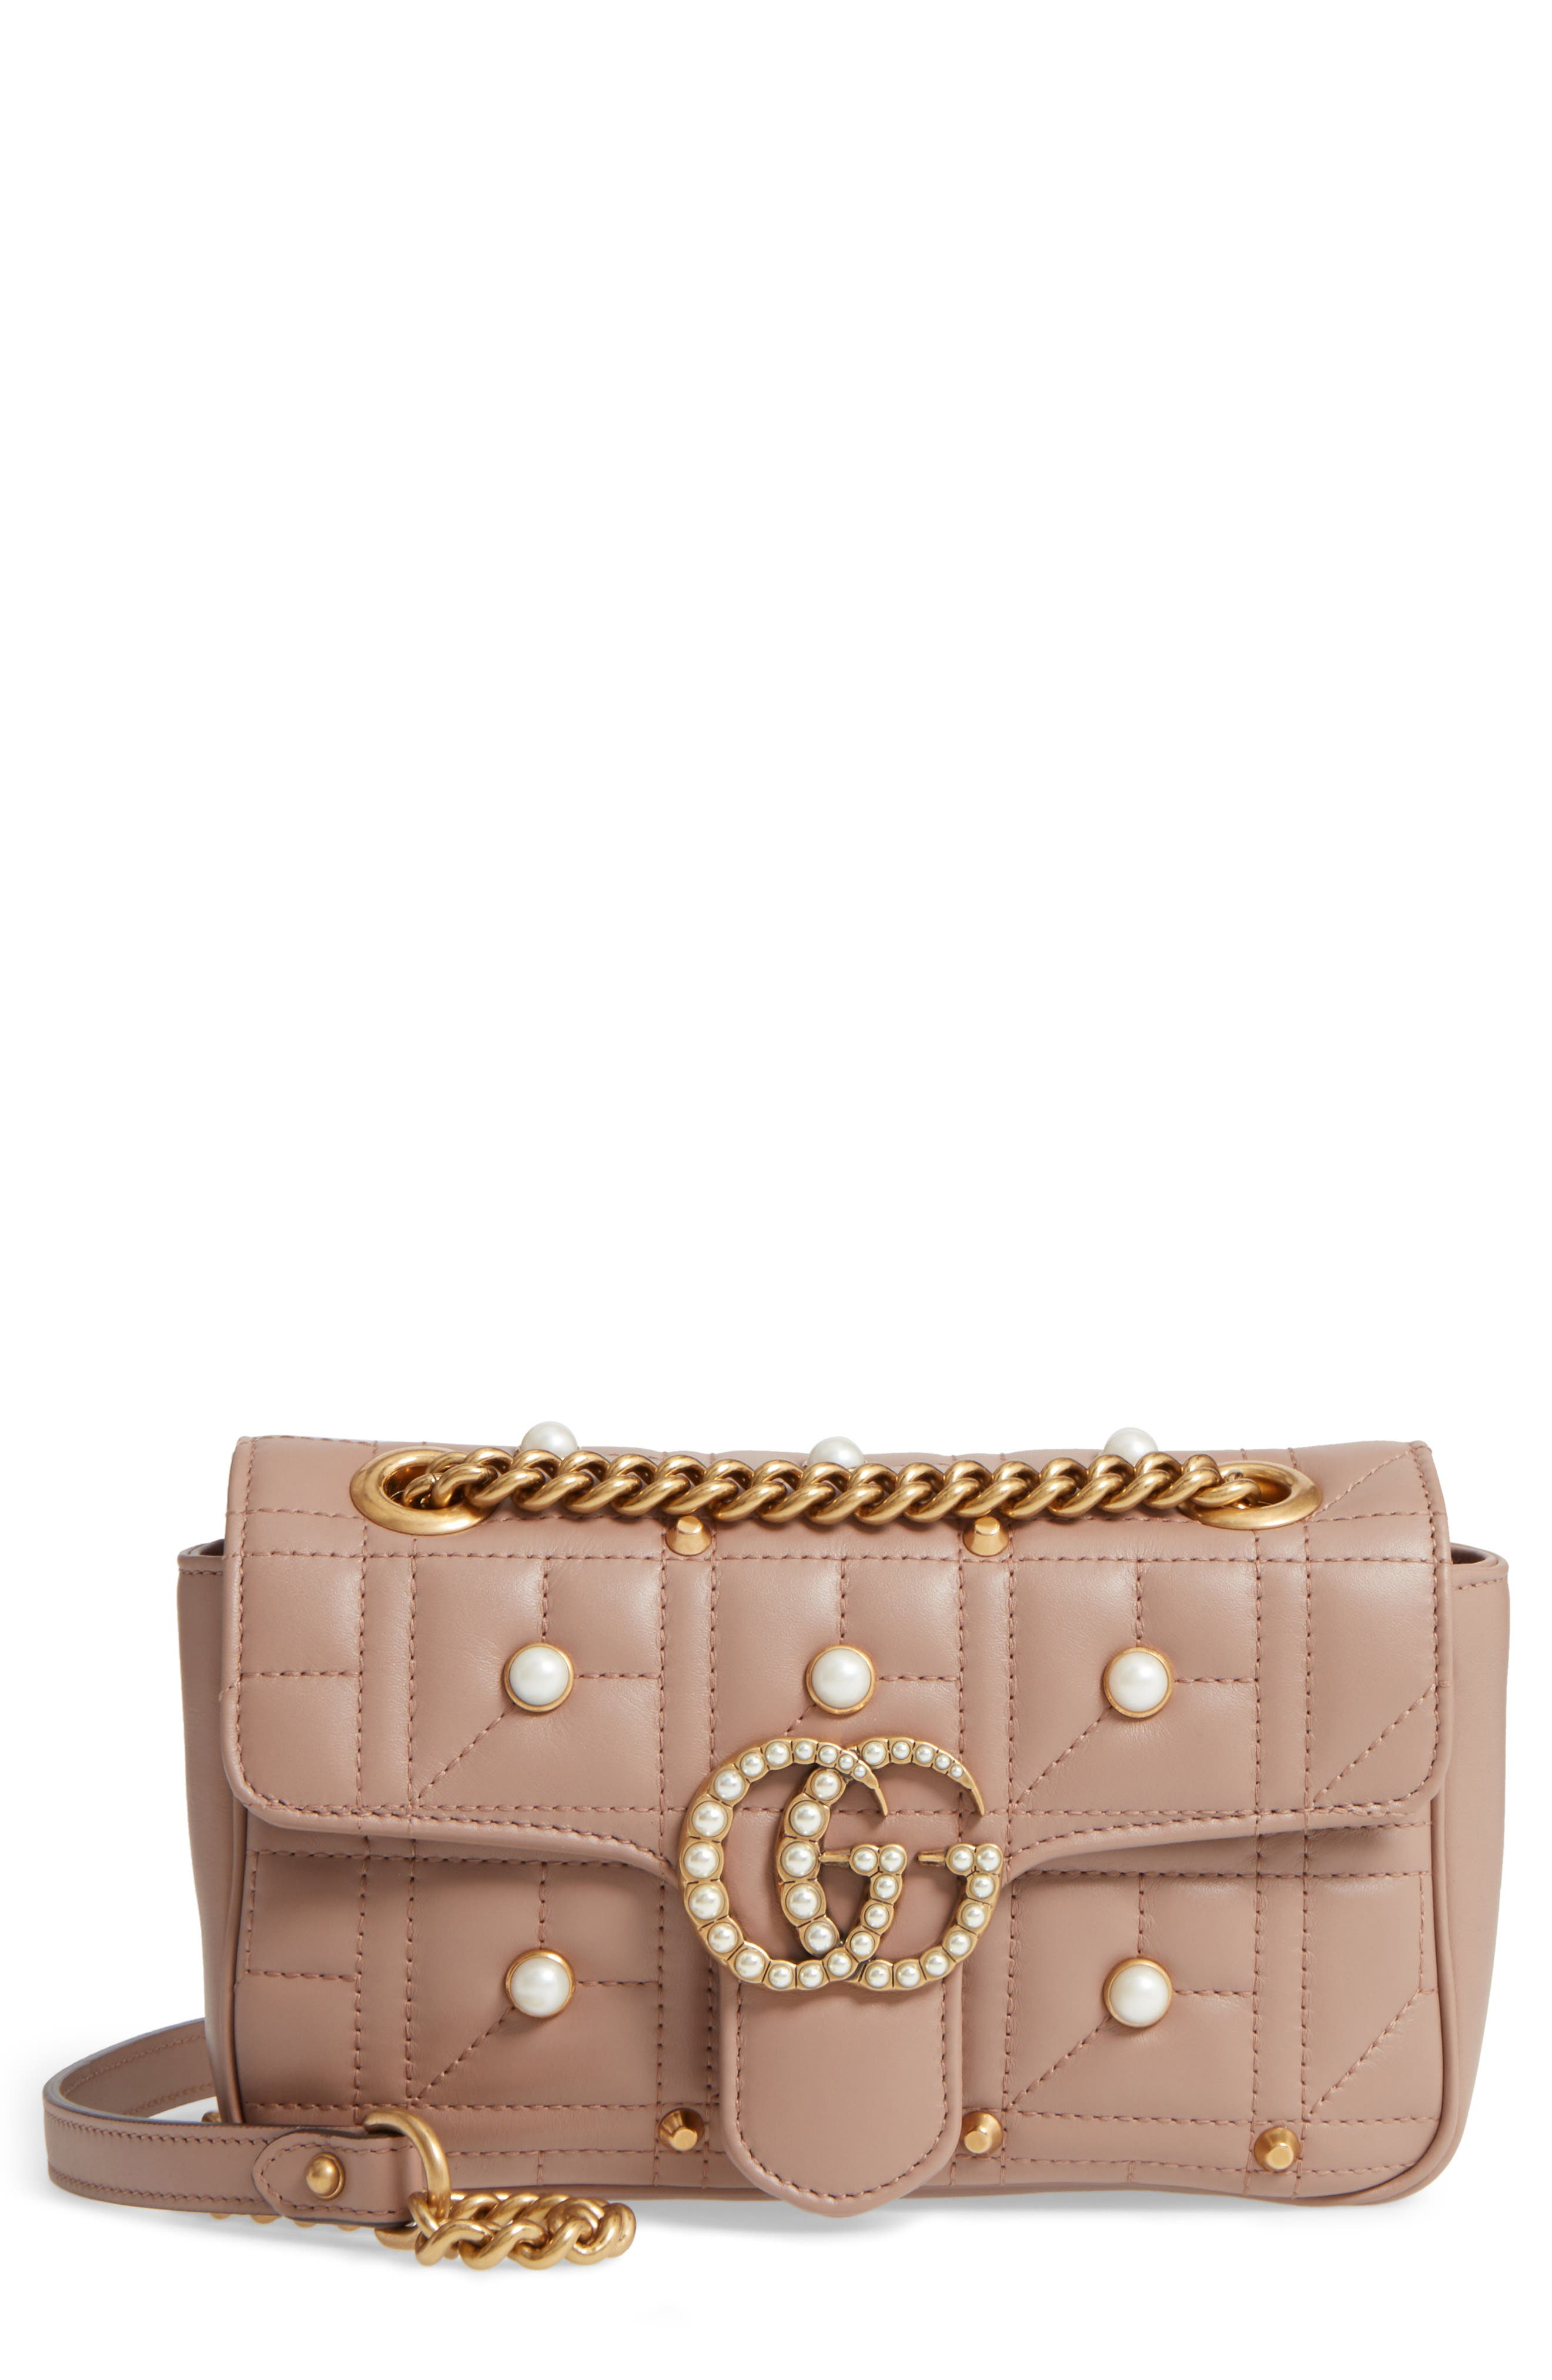 Alternate Image 1 Selected - Gucci Mini GG Marmont 2.0 Imitation Pearl Logo Matelassé Leather Shoulder Bag